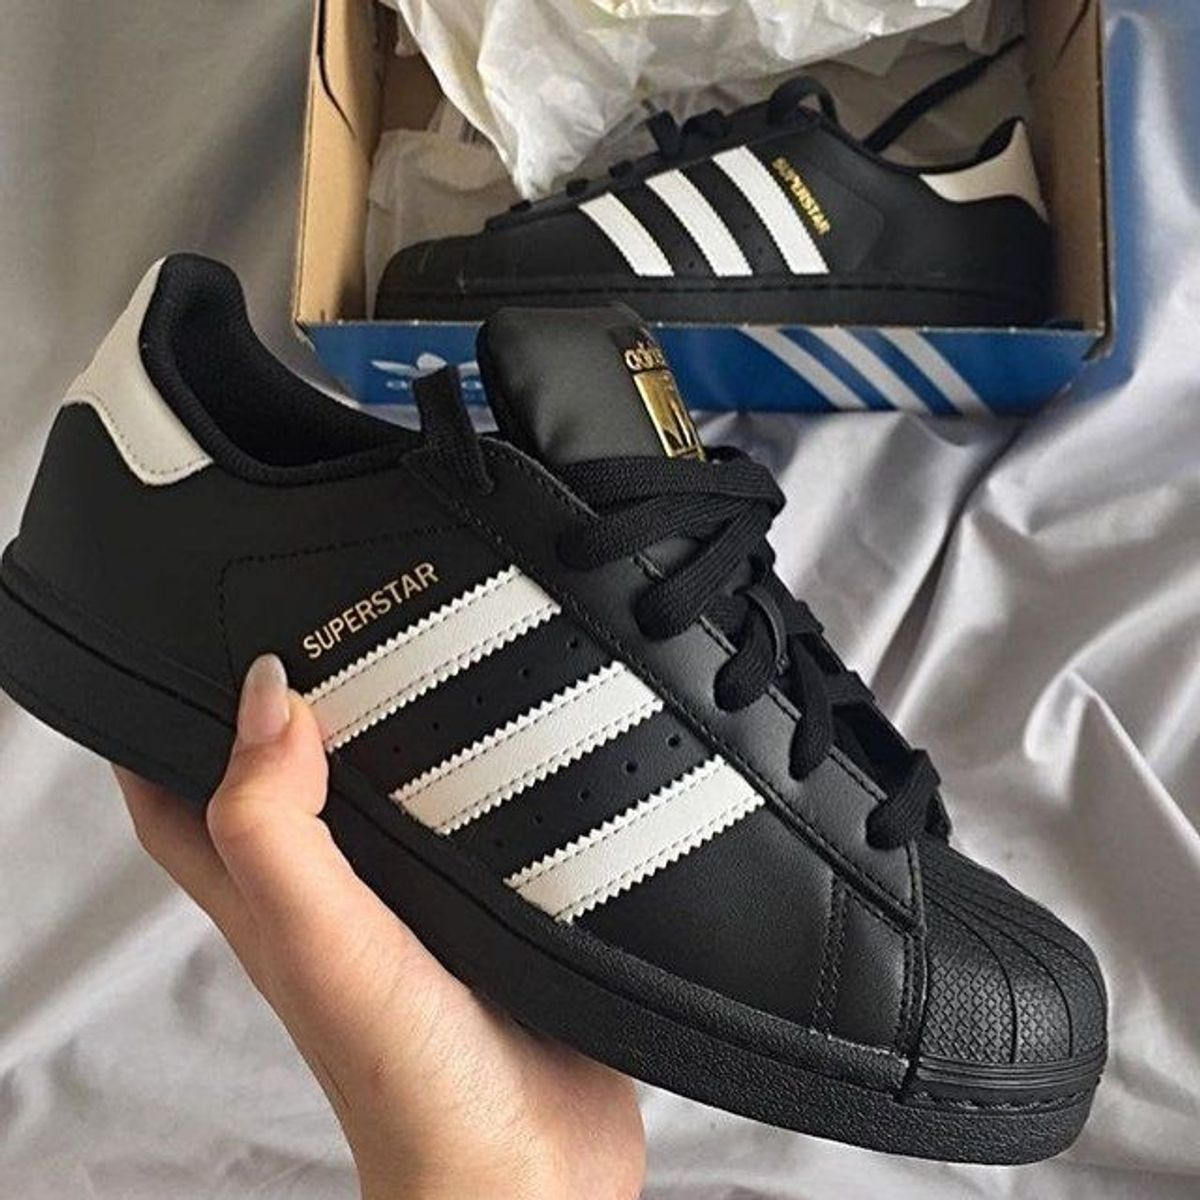 separation shoes 1991b 221dc Adidas Superstar - Preto Branco   Tênis Masculino Adidas Nunca Usado  31512998   enjoei